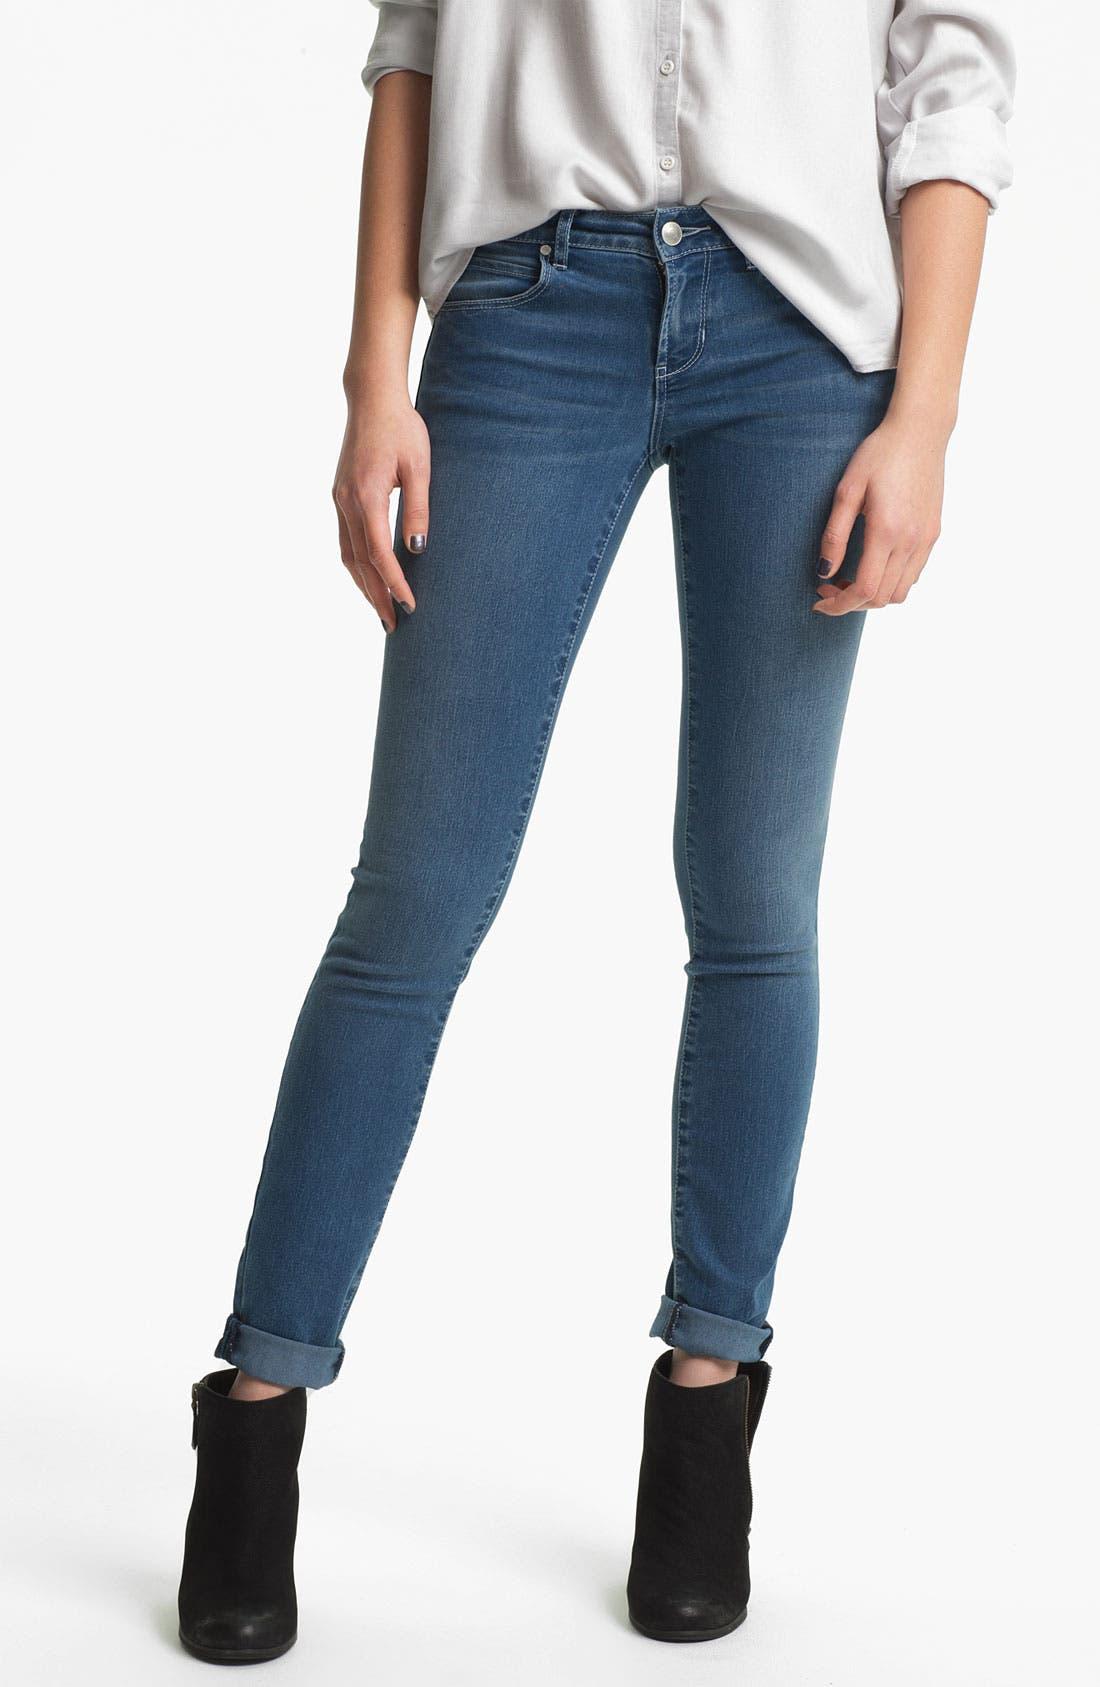 Alternate Image 1 Selected - Articles of Society 'Mya' Skinny Jeans (Atlantic) (Juniors)